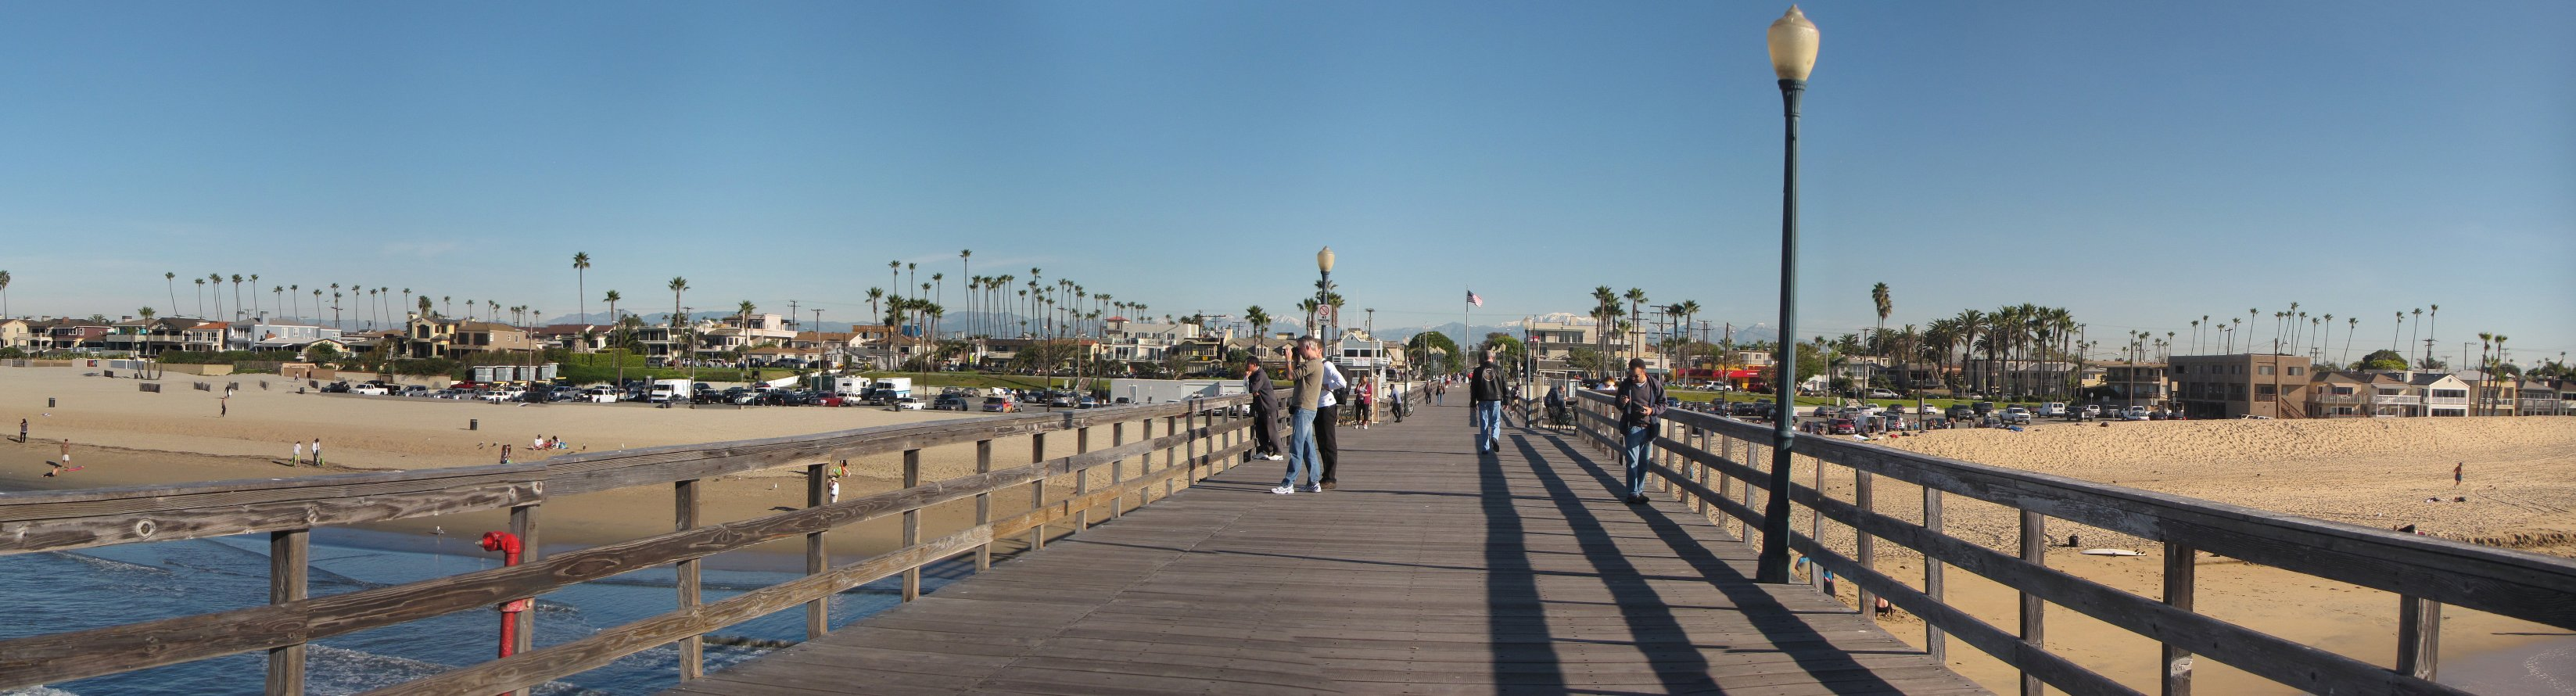 Long Beach Pier Pressure Labor Sunday Yacht Party September